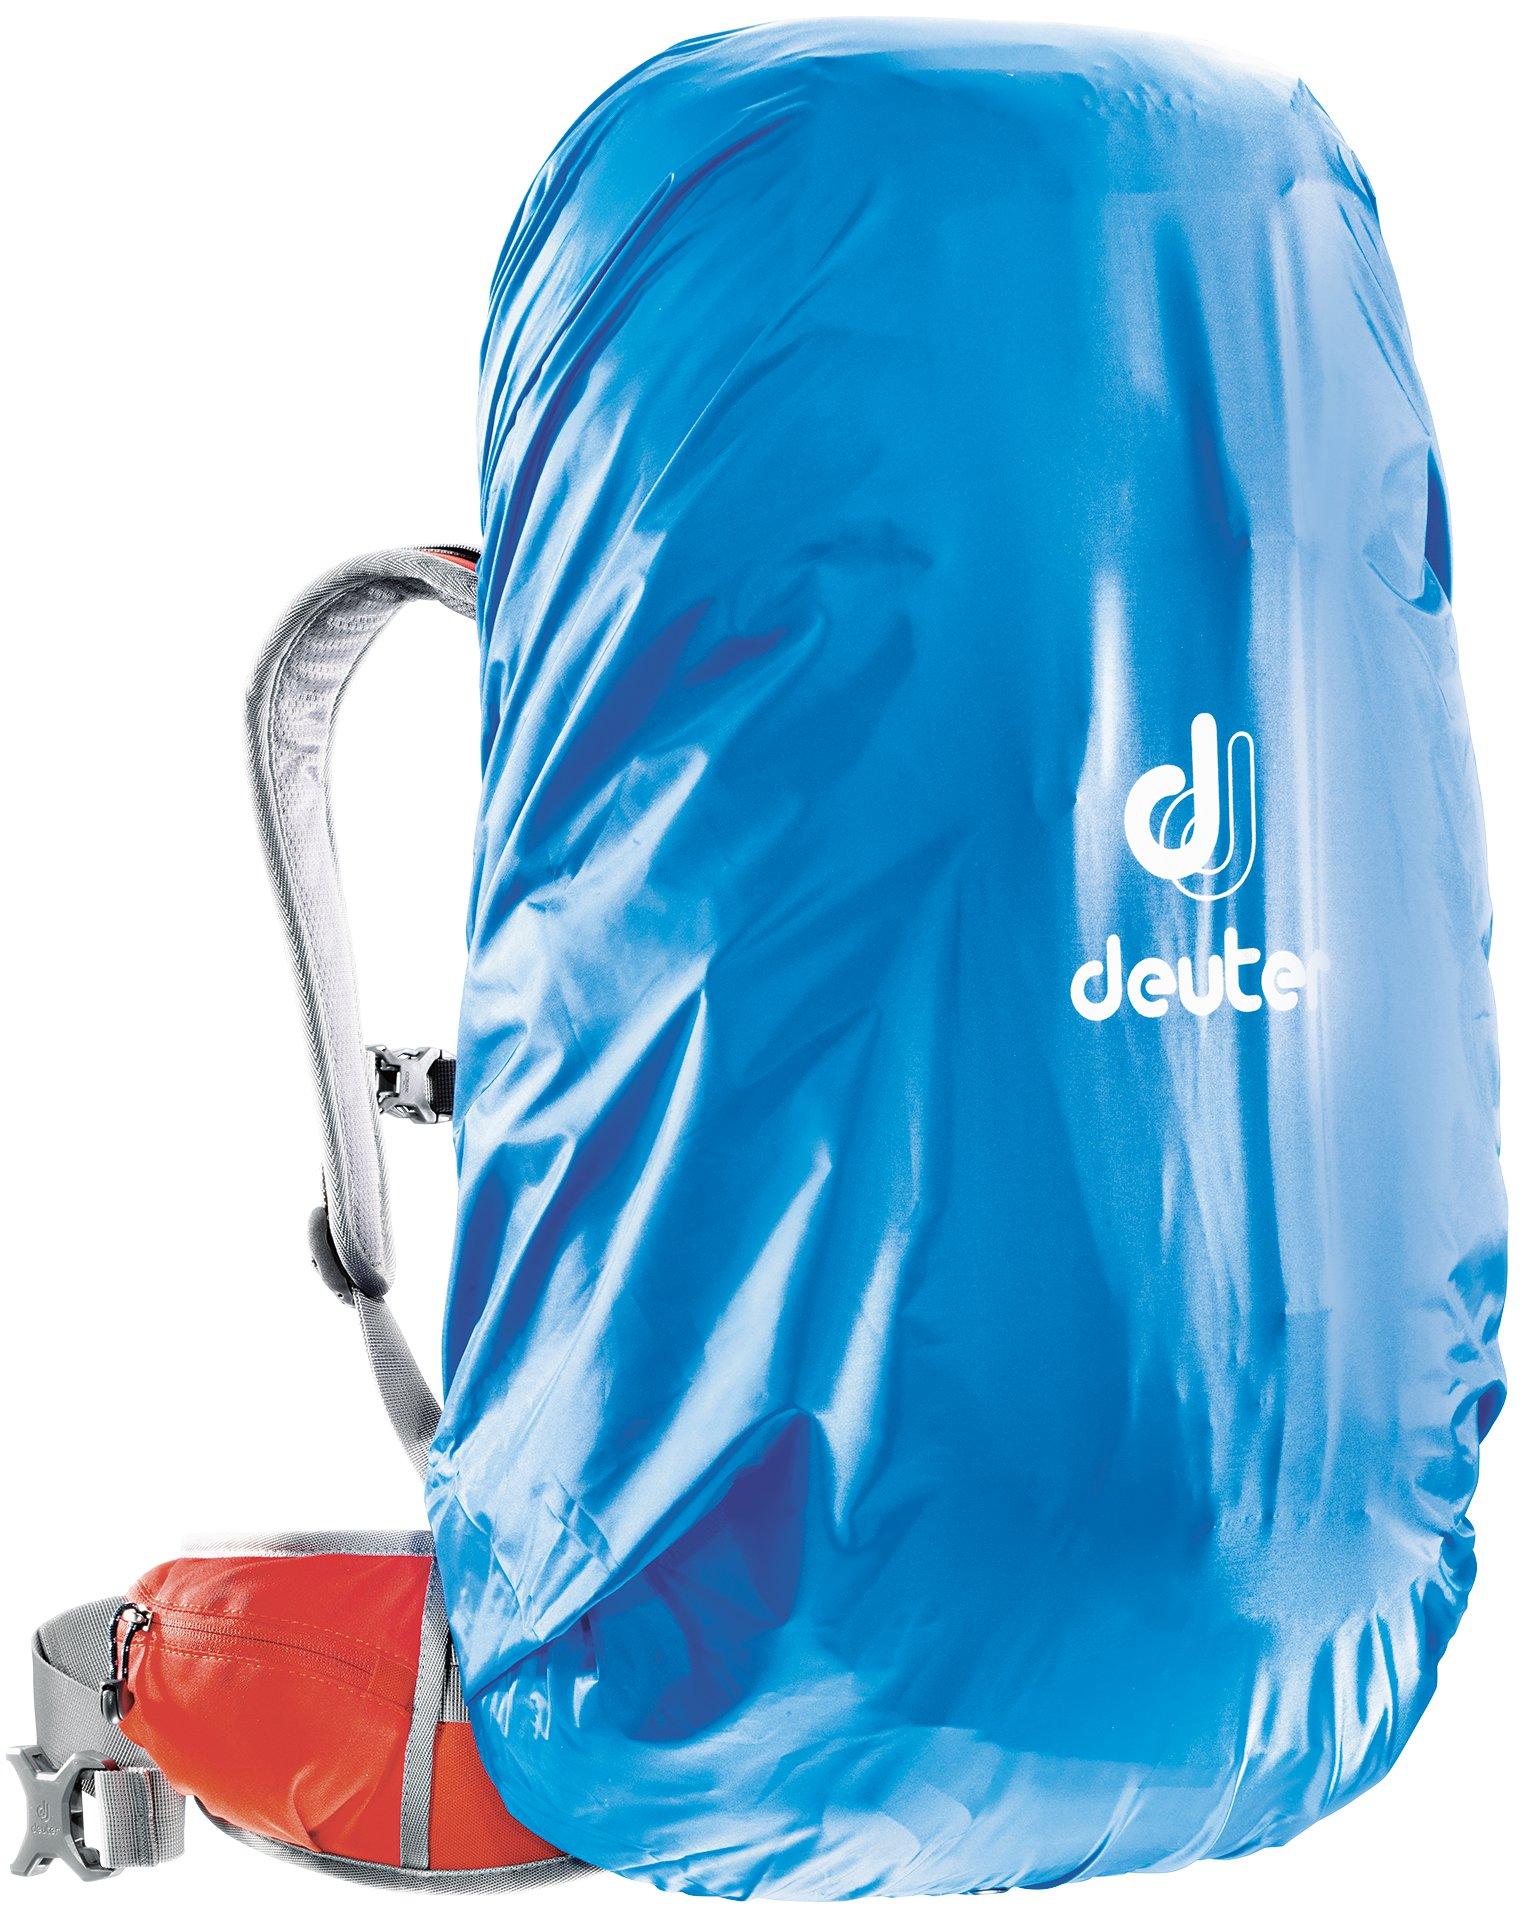 Deuter - Rain Cover II, Regenschutz für den Rucksack